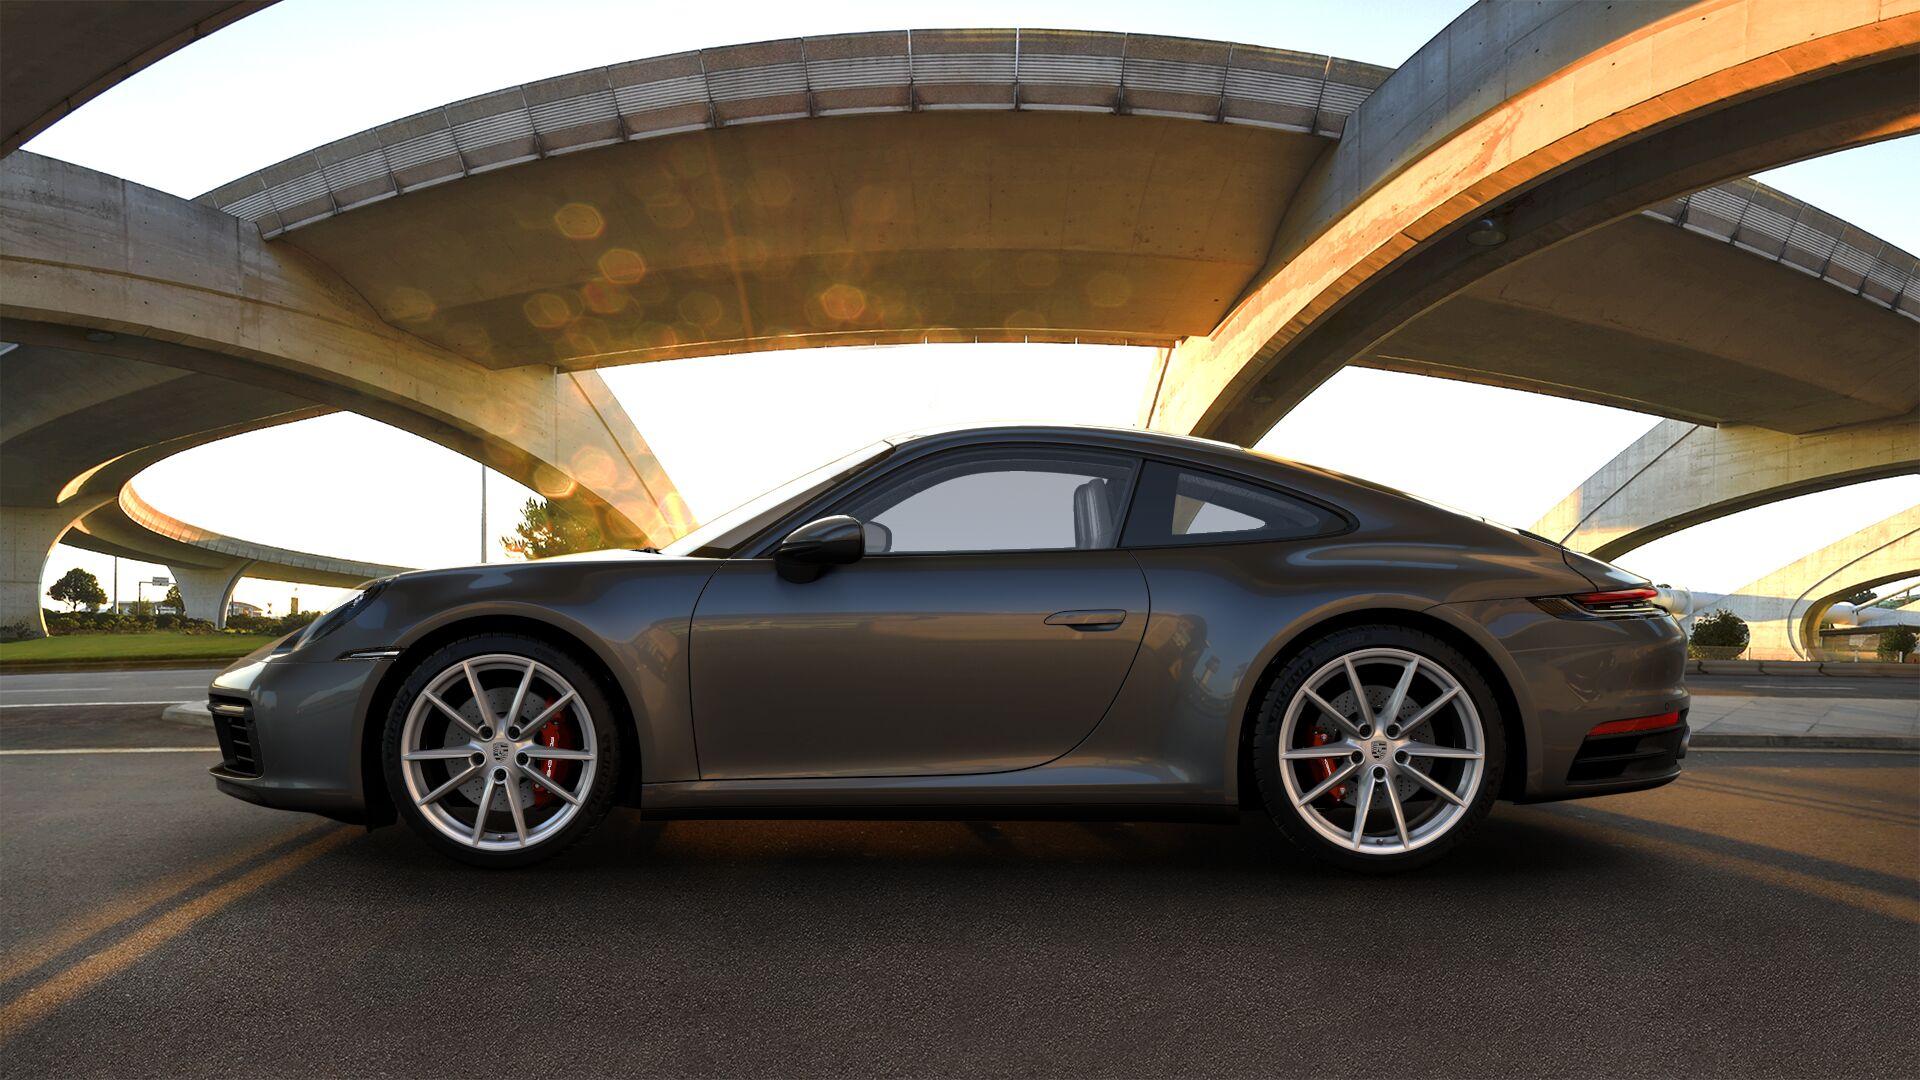 Black Metallic Wallpaper Agate Grey 2020 Porsche 911 Looks Understated In Real